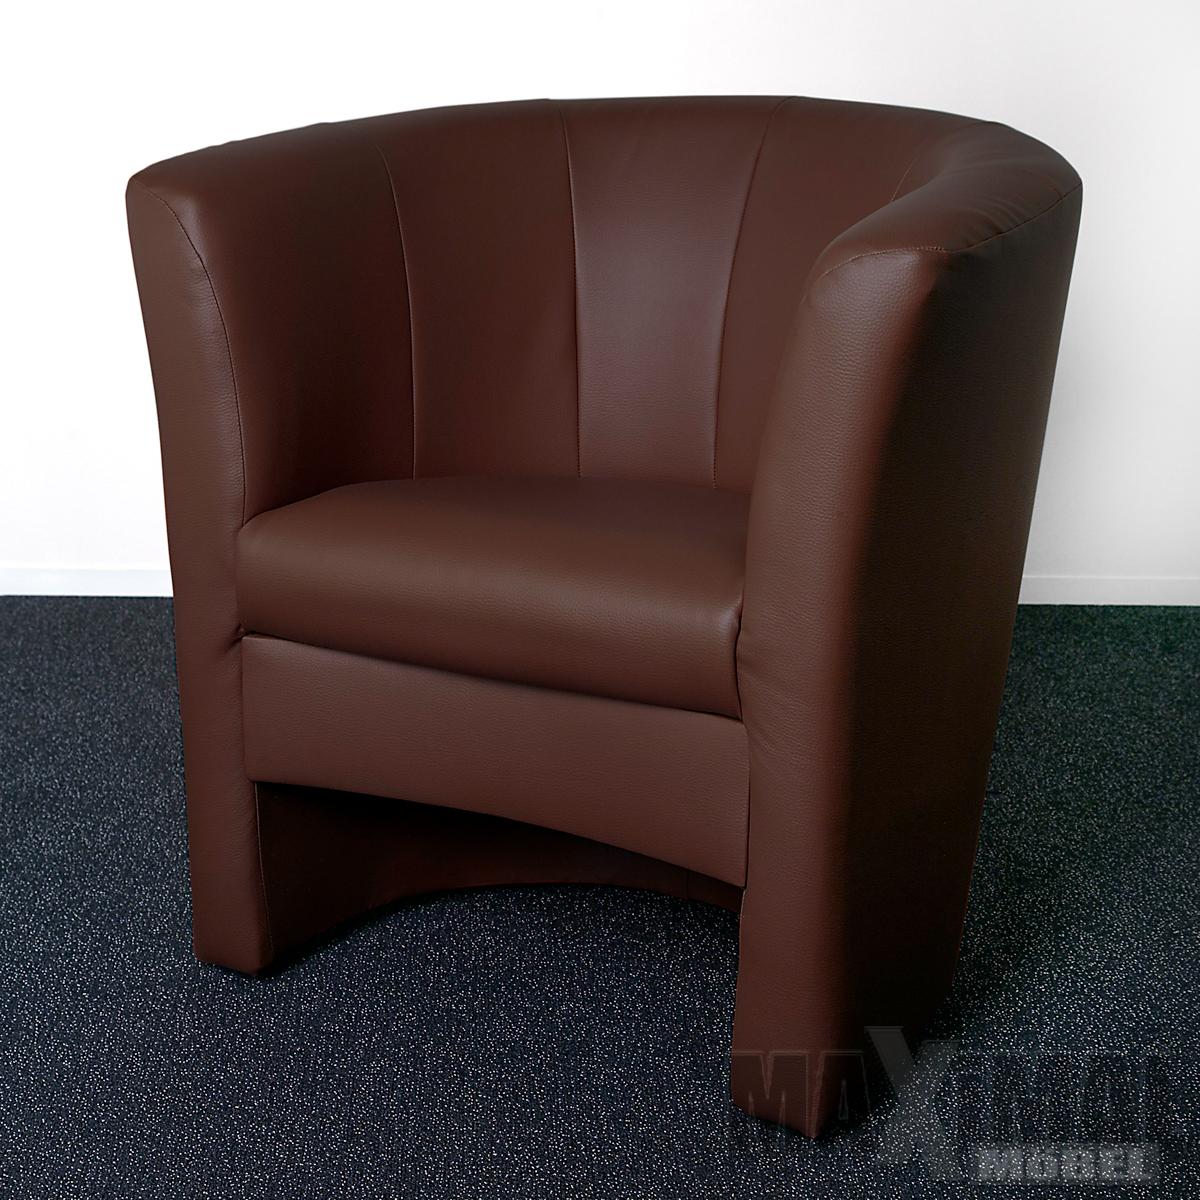 sessel mason kuhfell braun weiss clubsessel loungesessel ledersessel kuh neu ebay. Black Bedroom Furniture Sets. Home Design Ideas